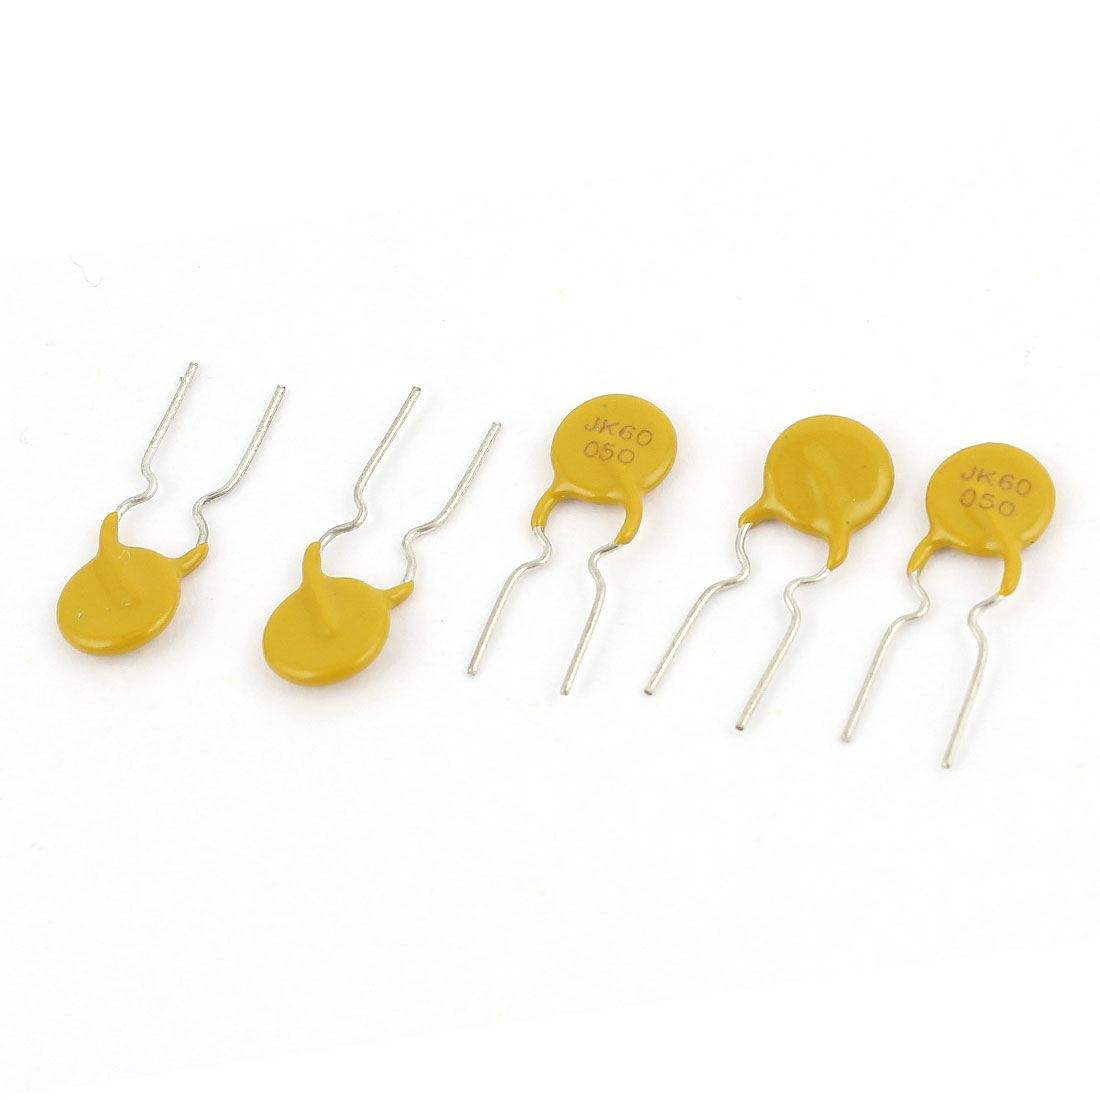 5 Pcs Polymer PPTC PTC DIP Resettable Fuse 60V 0.5A 500mA JK60-050